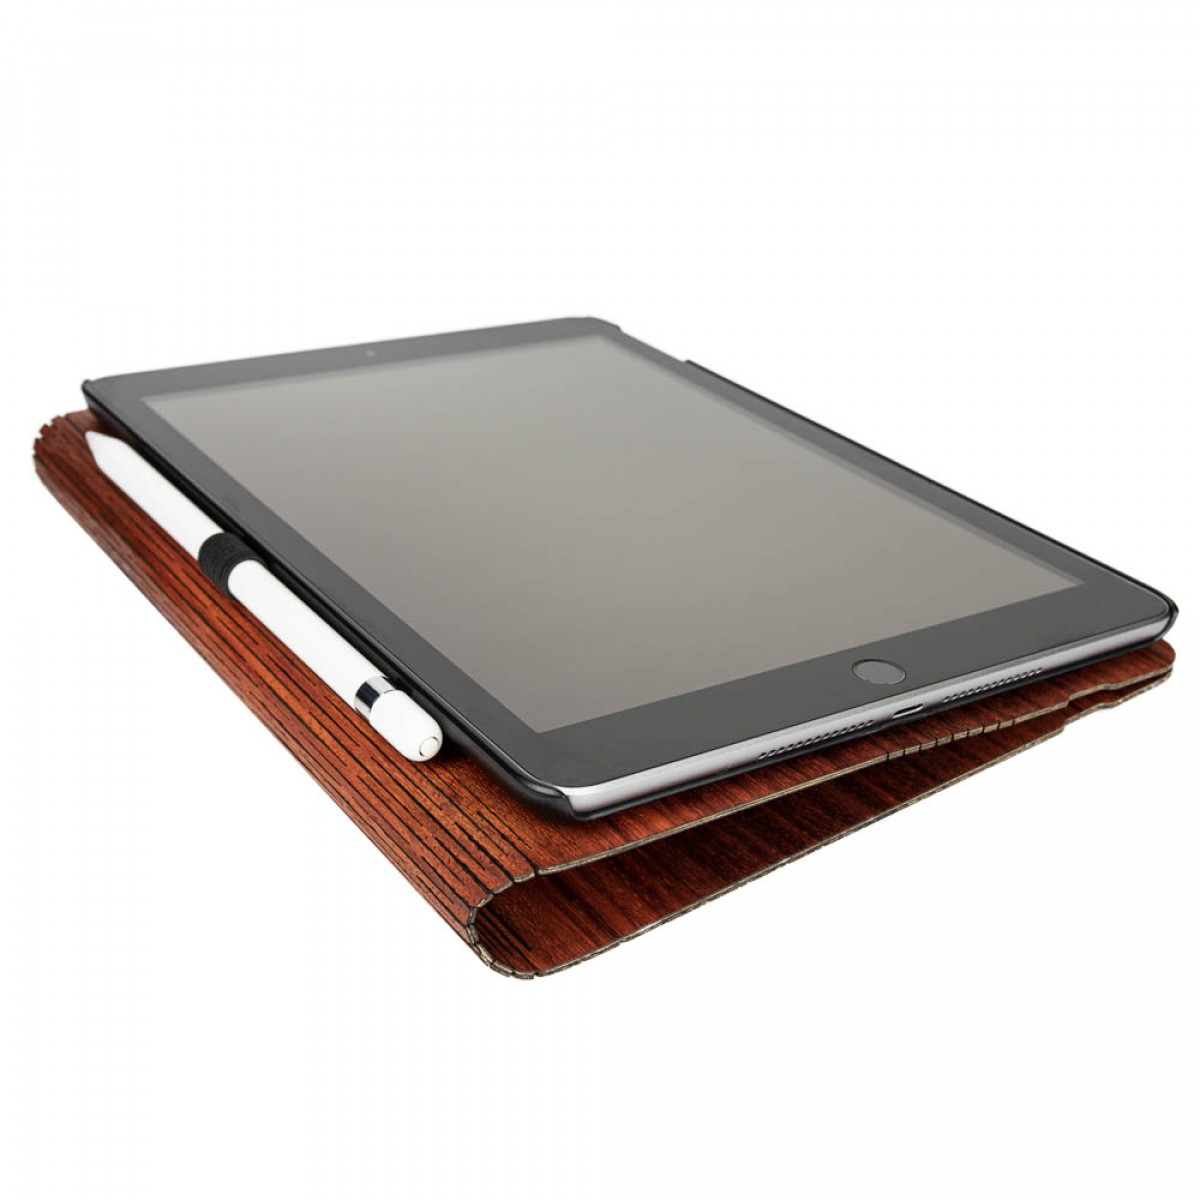 JUNGHOLZ Design WoodCase, Tablet, Padouk, iPad 5.& 6. Generation